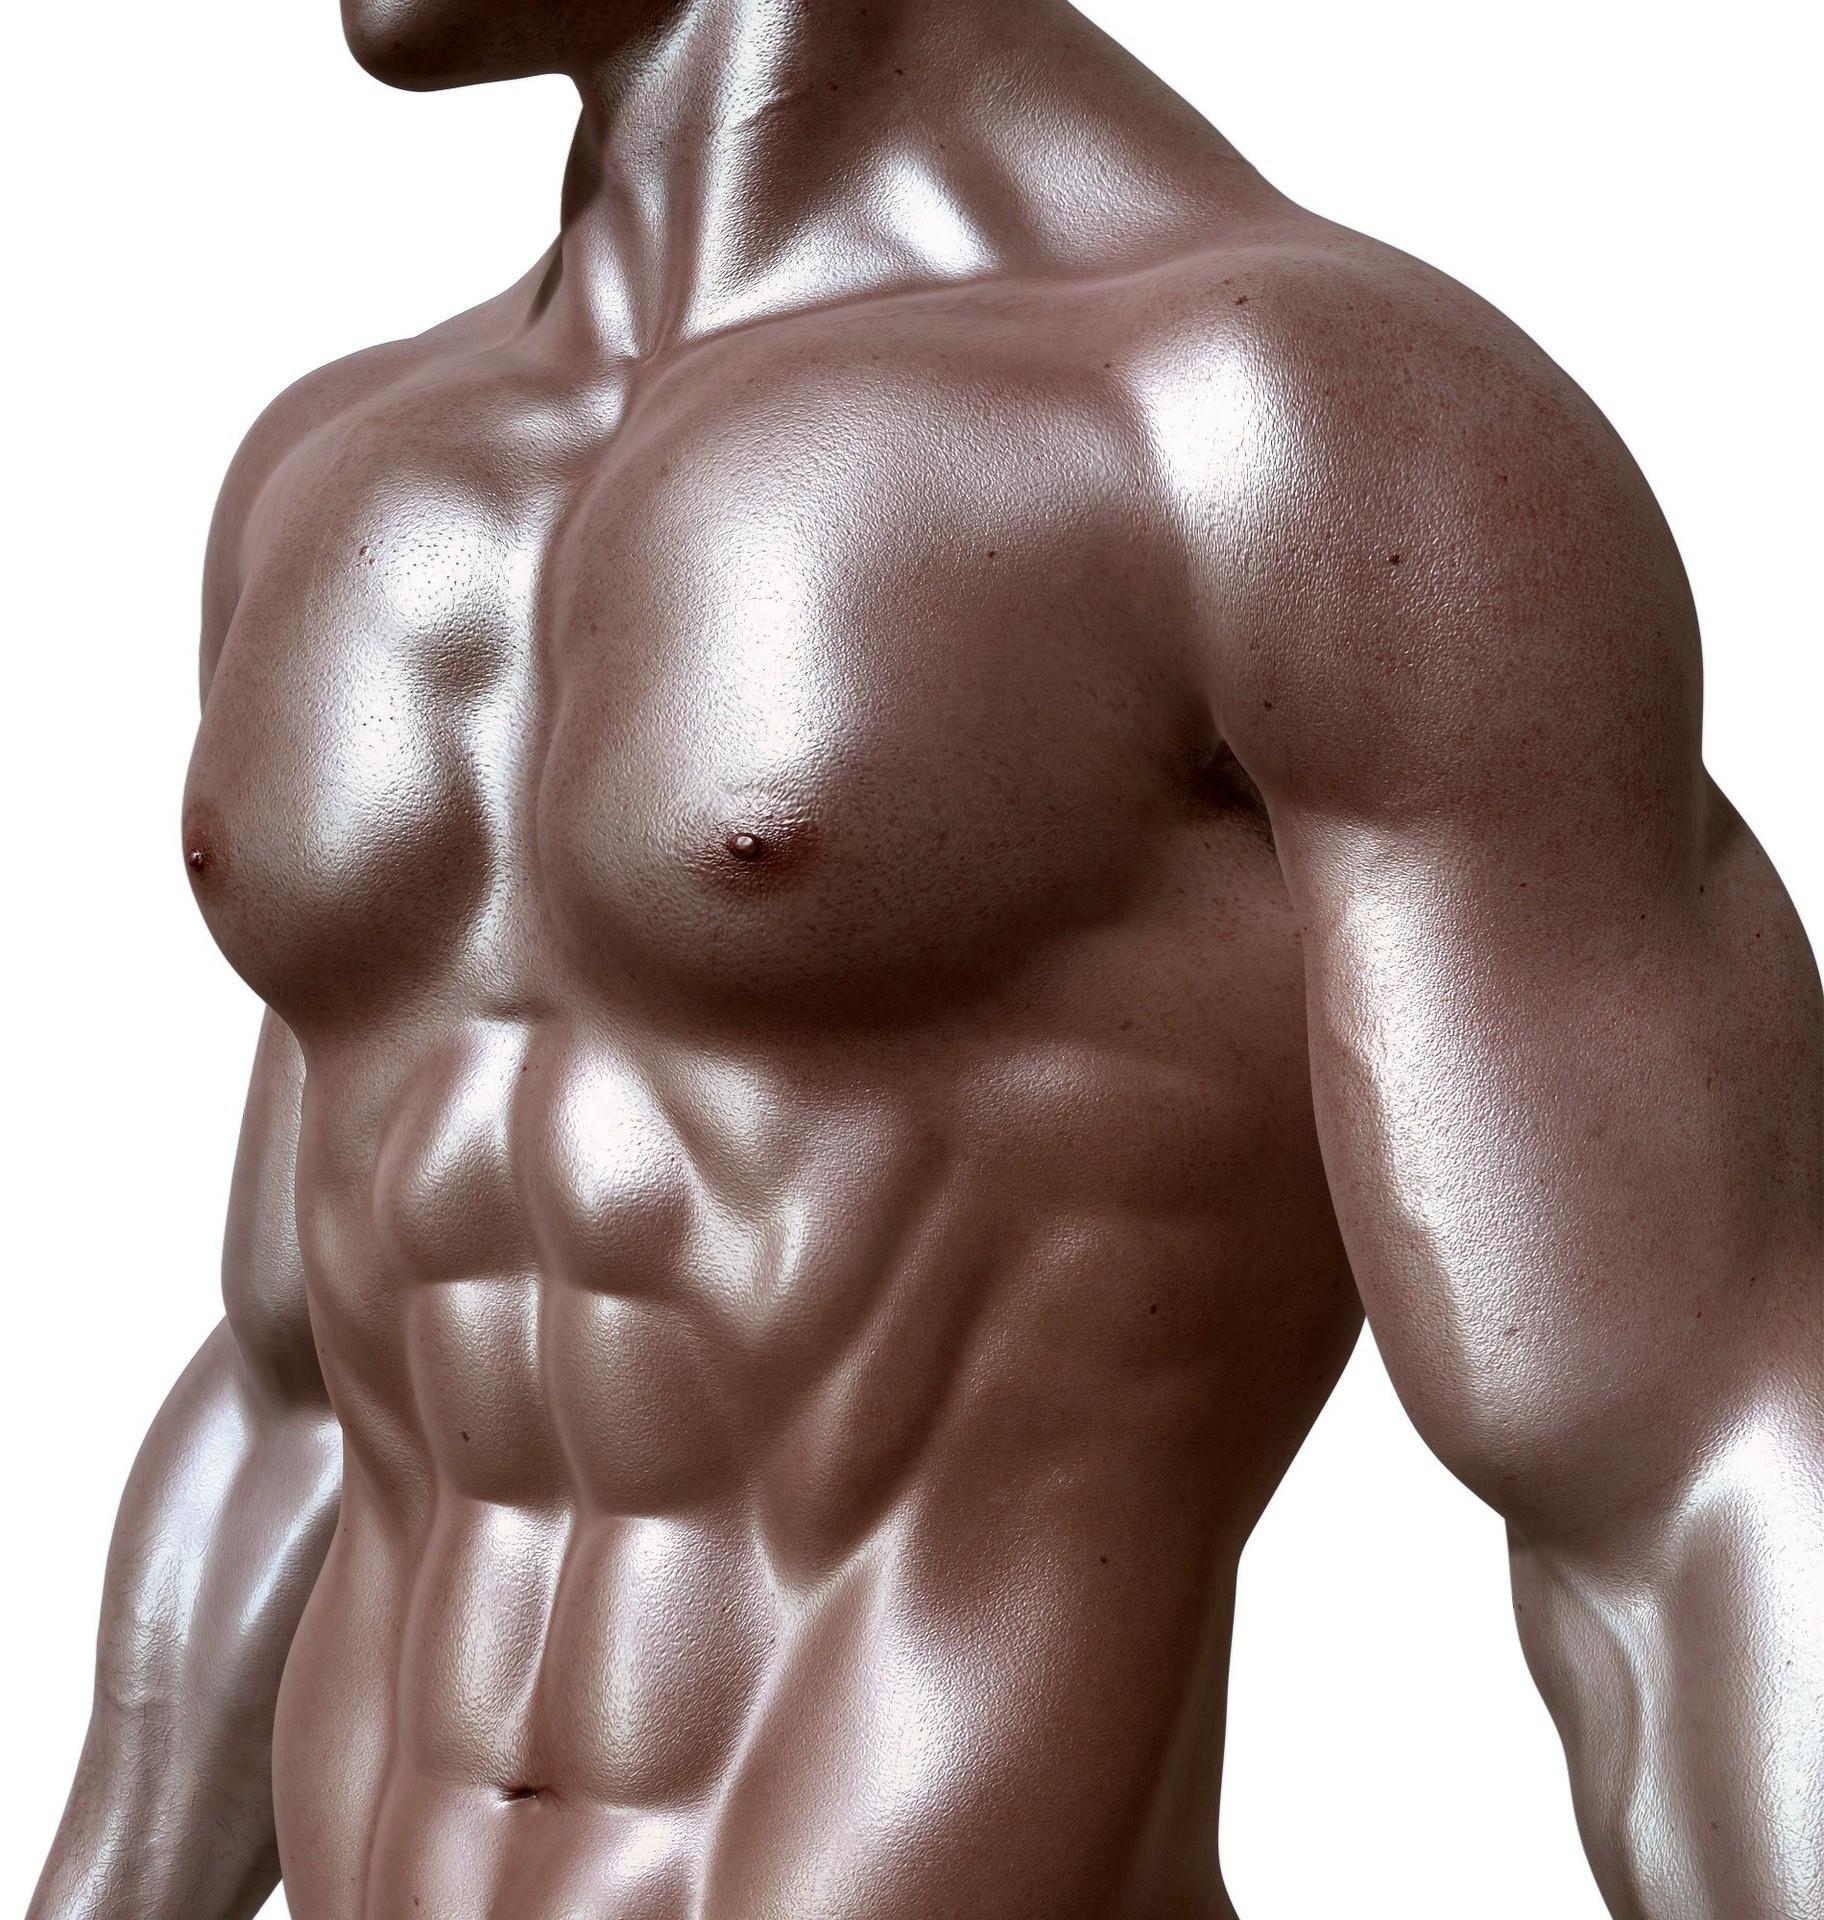 Das Klimmzugtraining beansprucht verschiedenen Muskelgruppen